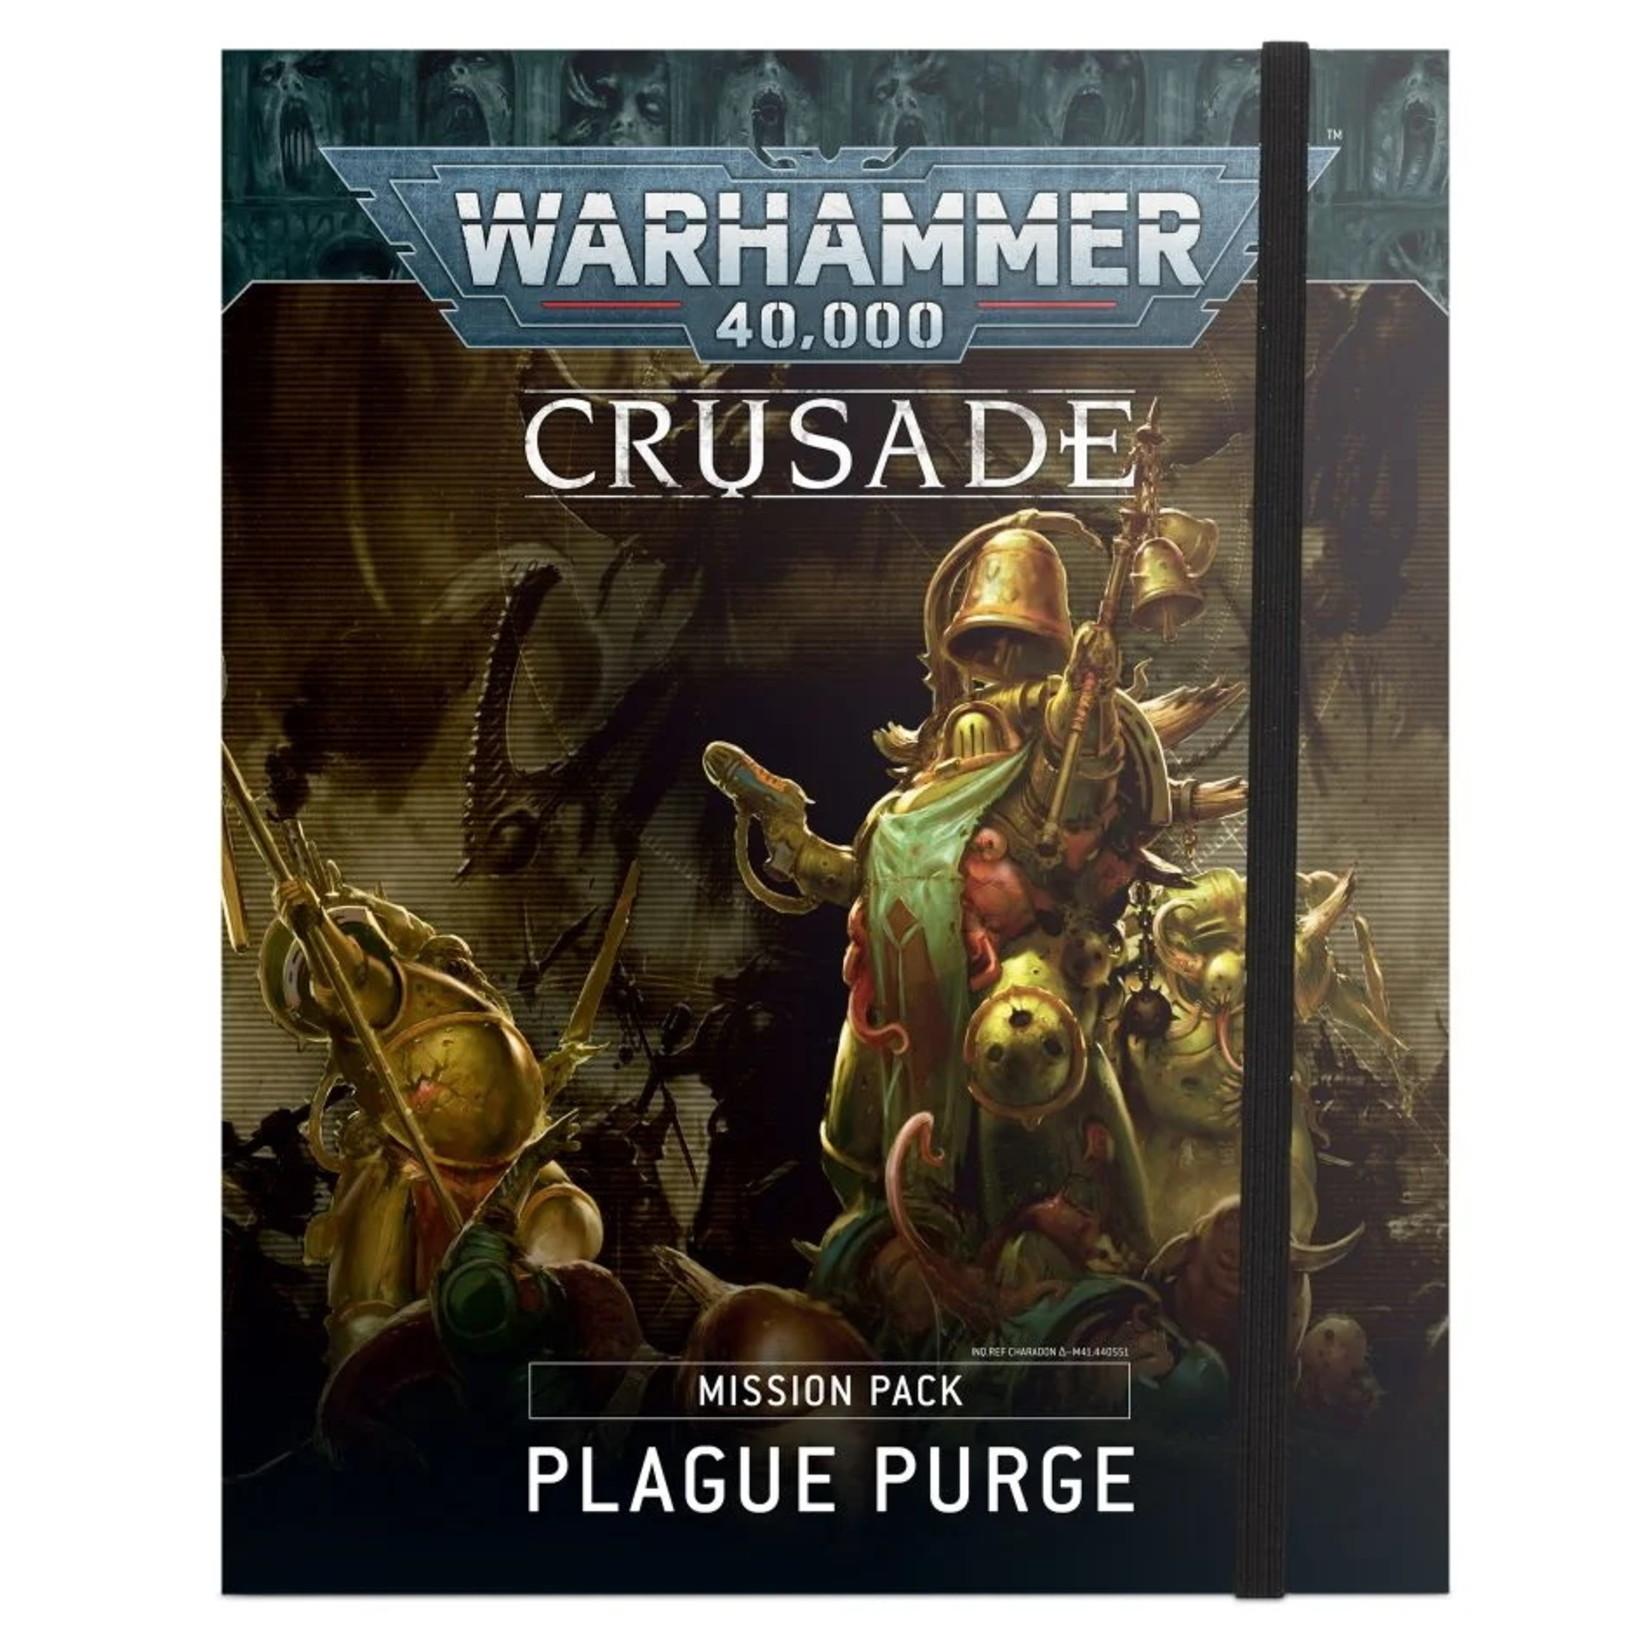 Games Workshop Crusade Mission Pack: Plague Purge